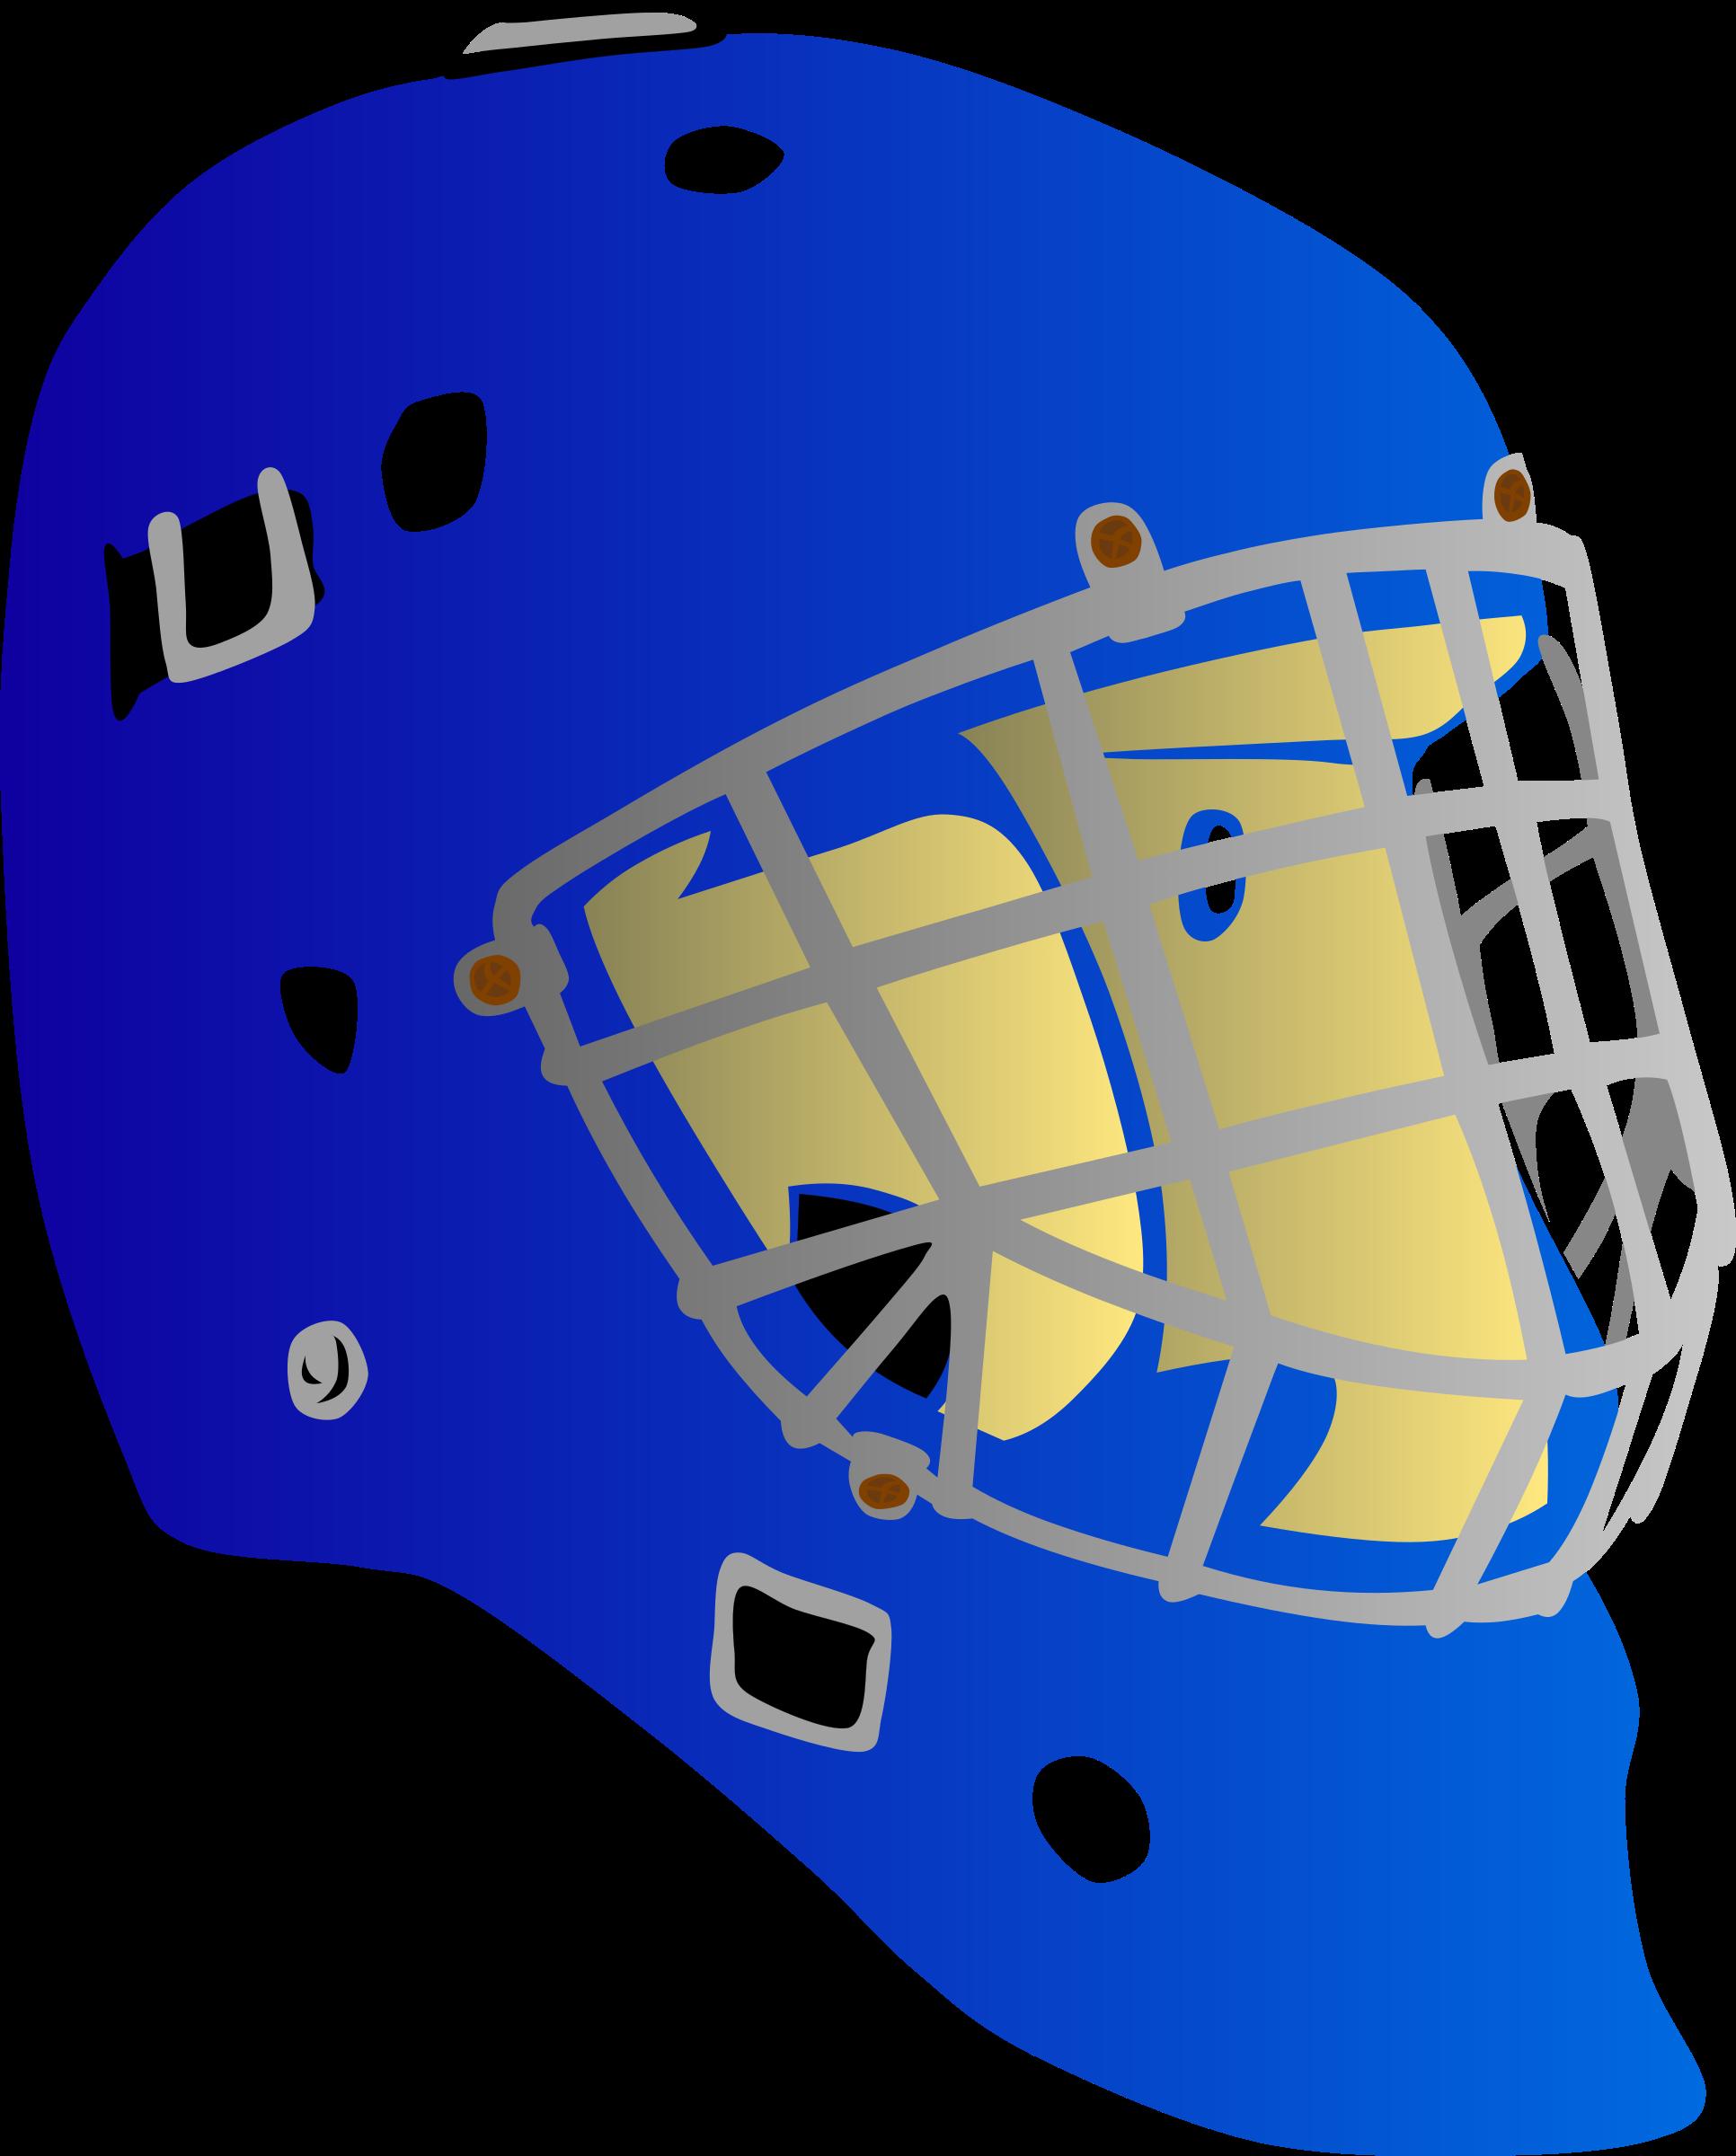 Goalie mask big image. Lacrosse clipart blue